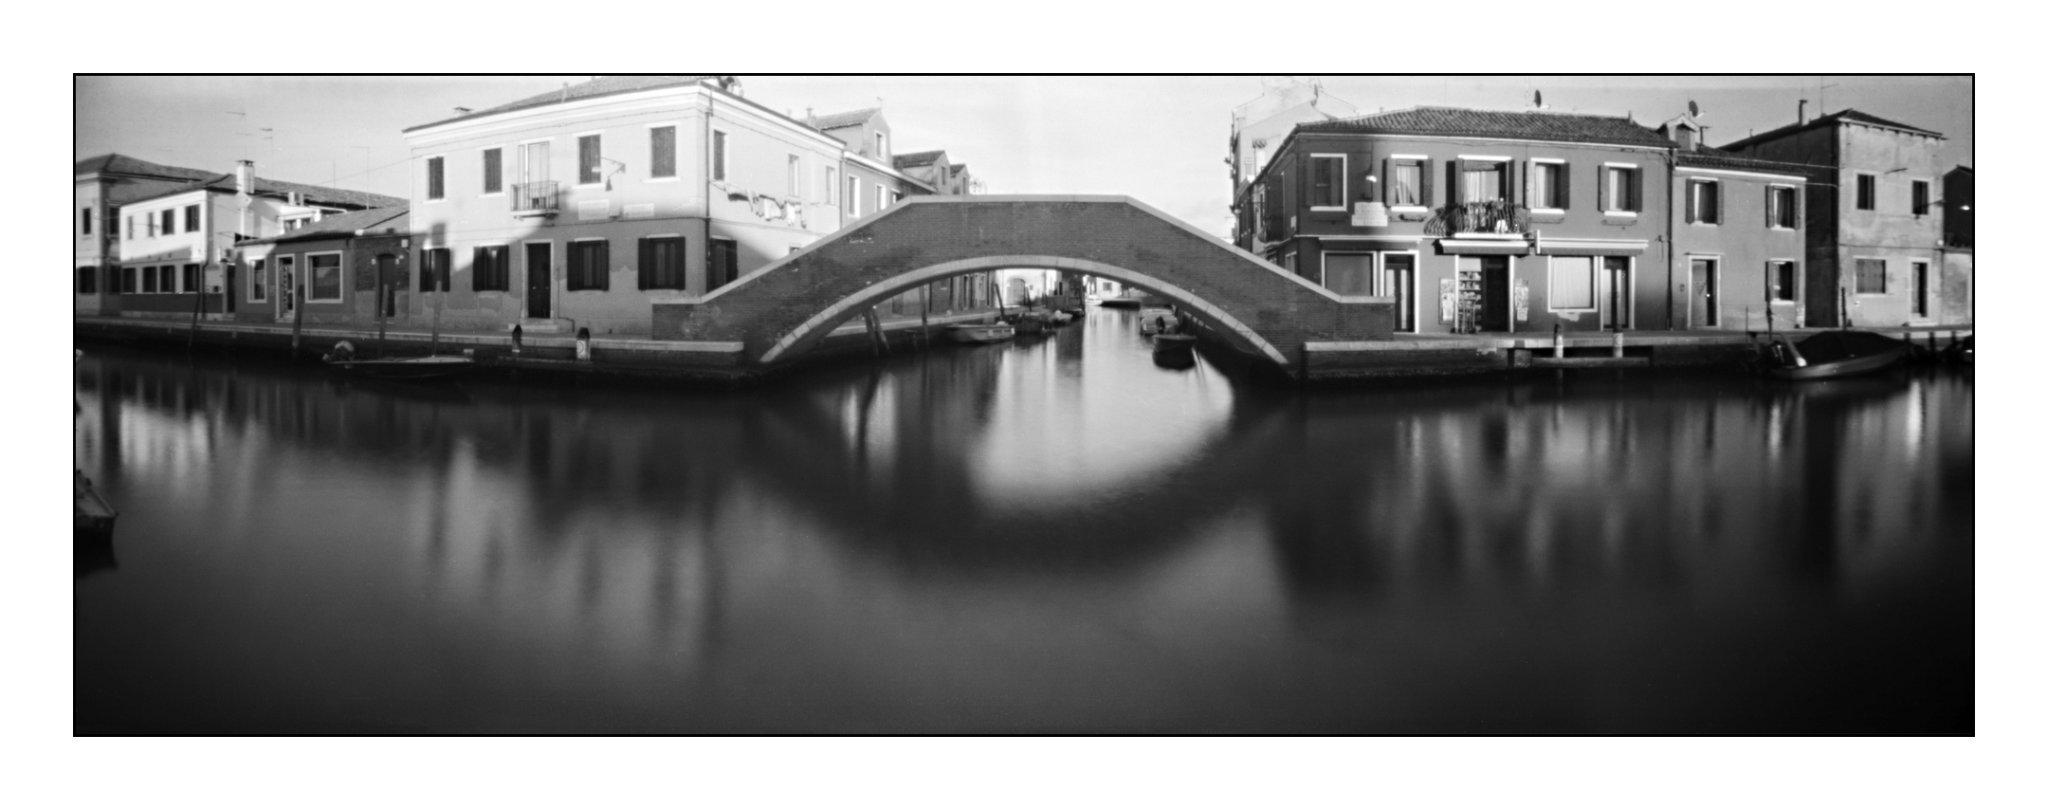 Murano, Lochkamera 16x7 analog: Venedig, Fotograf: Steffen Lohse